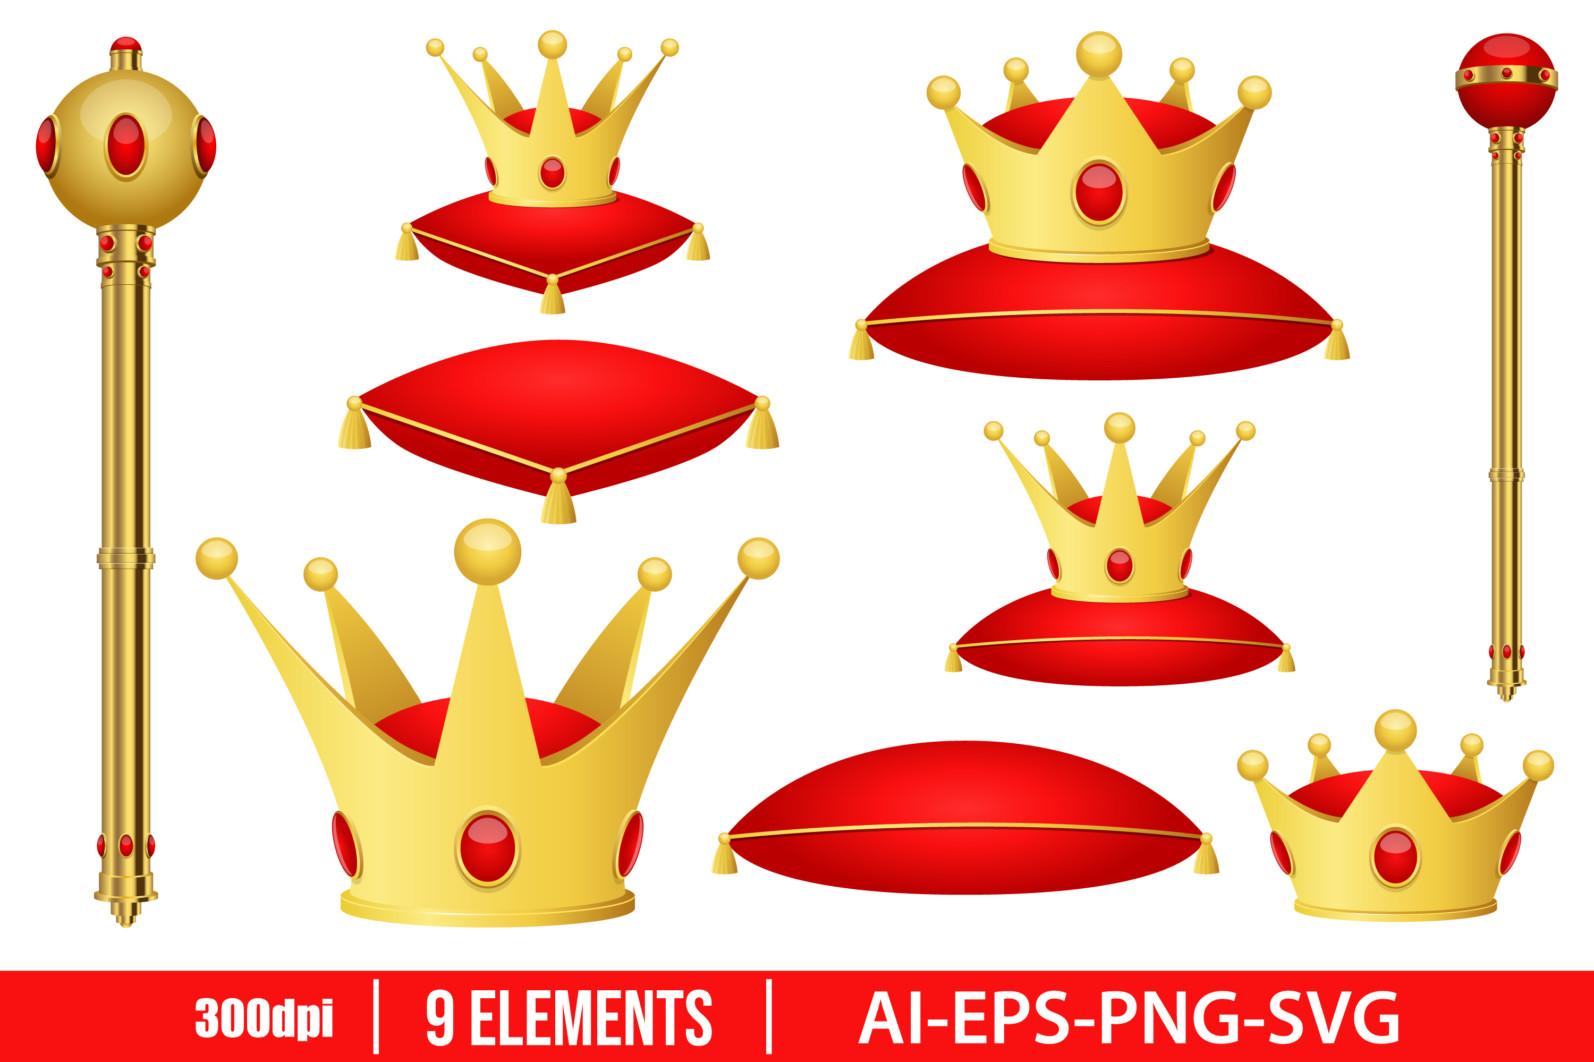 Golden king crown and scepter clipart vector design illustration. King set. Vector Clipart Print - GOLDEN CROWN AND SCEPTER scaled -